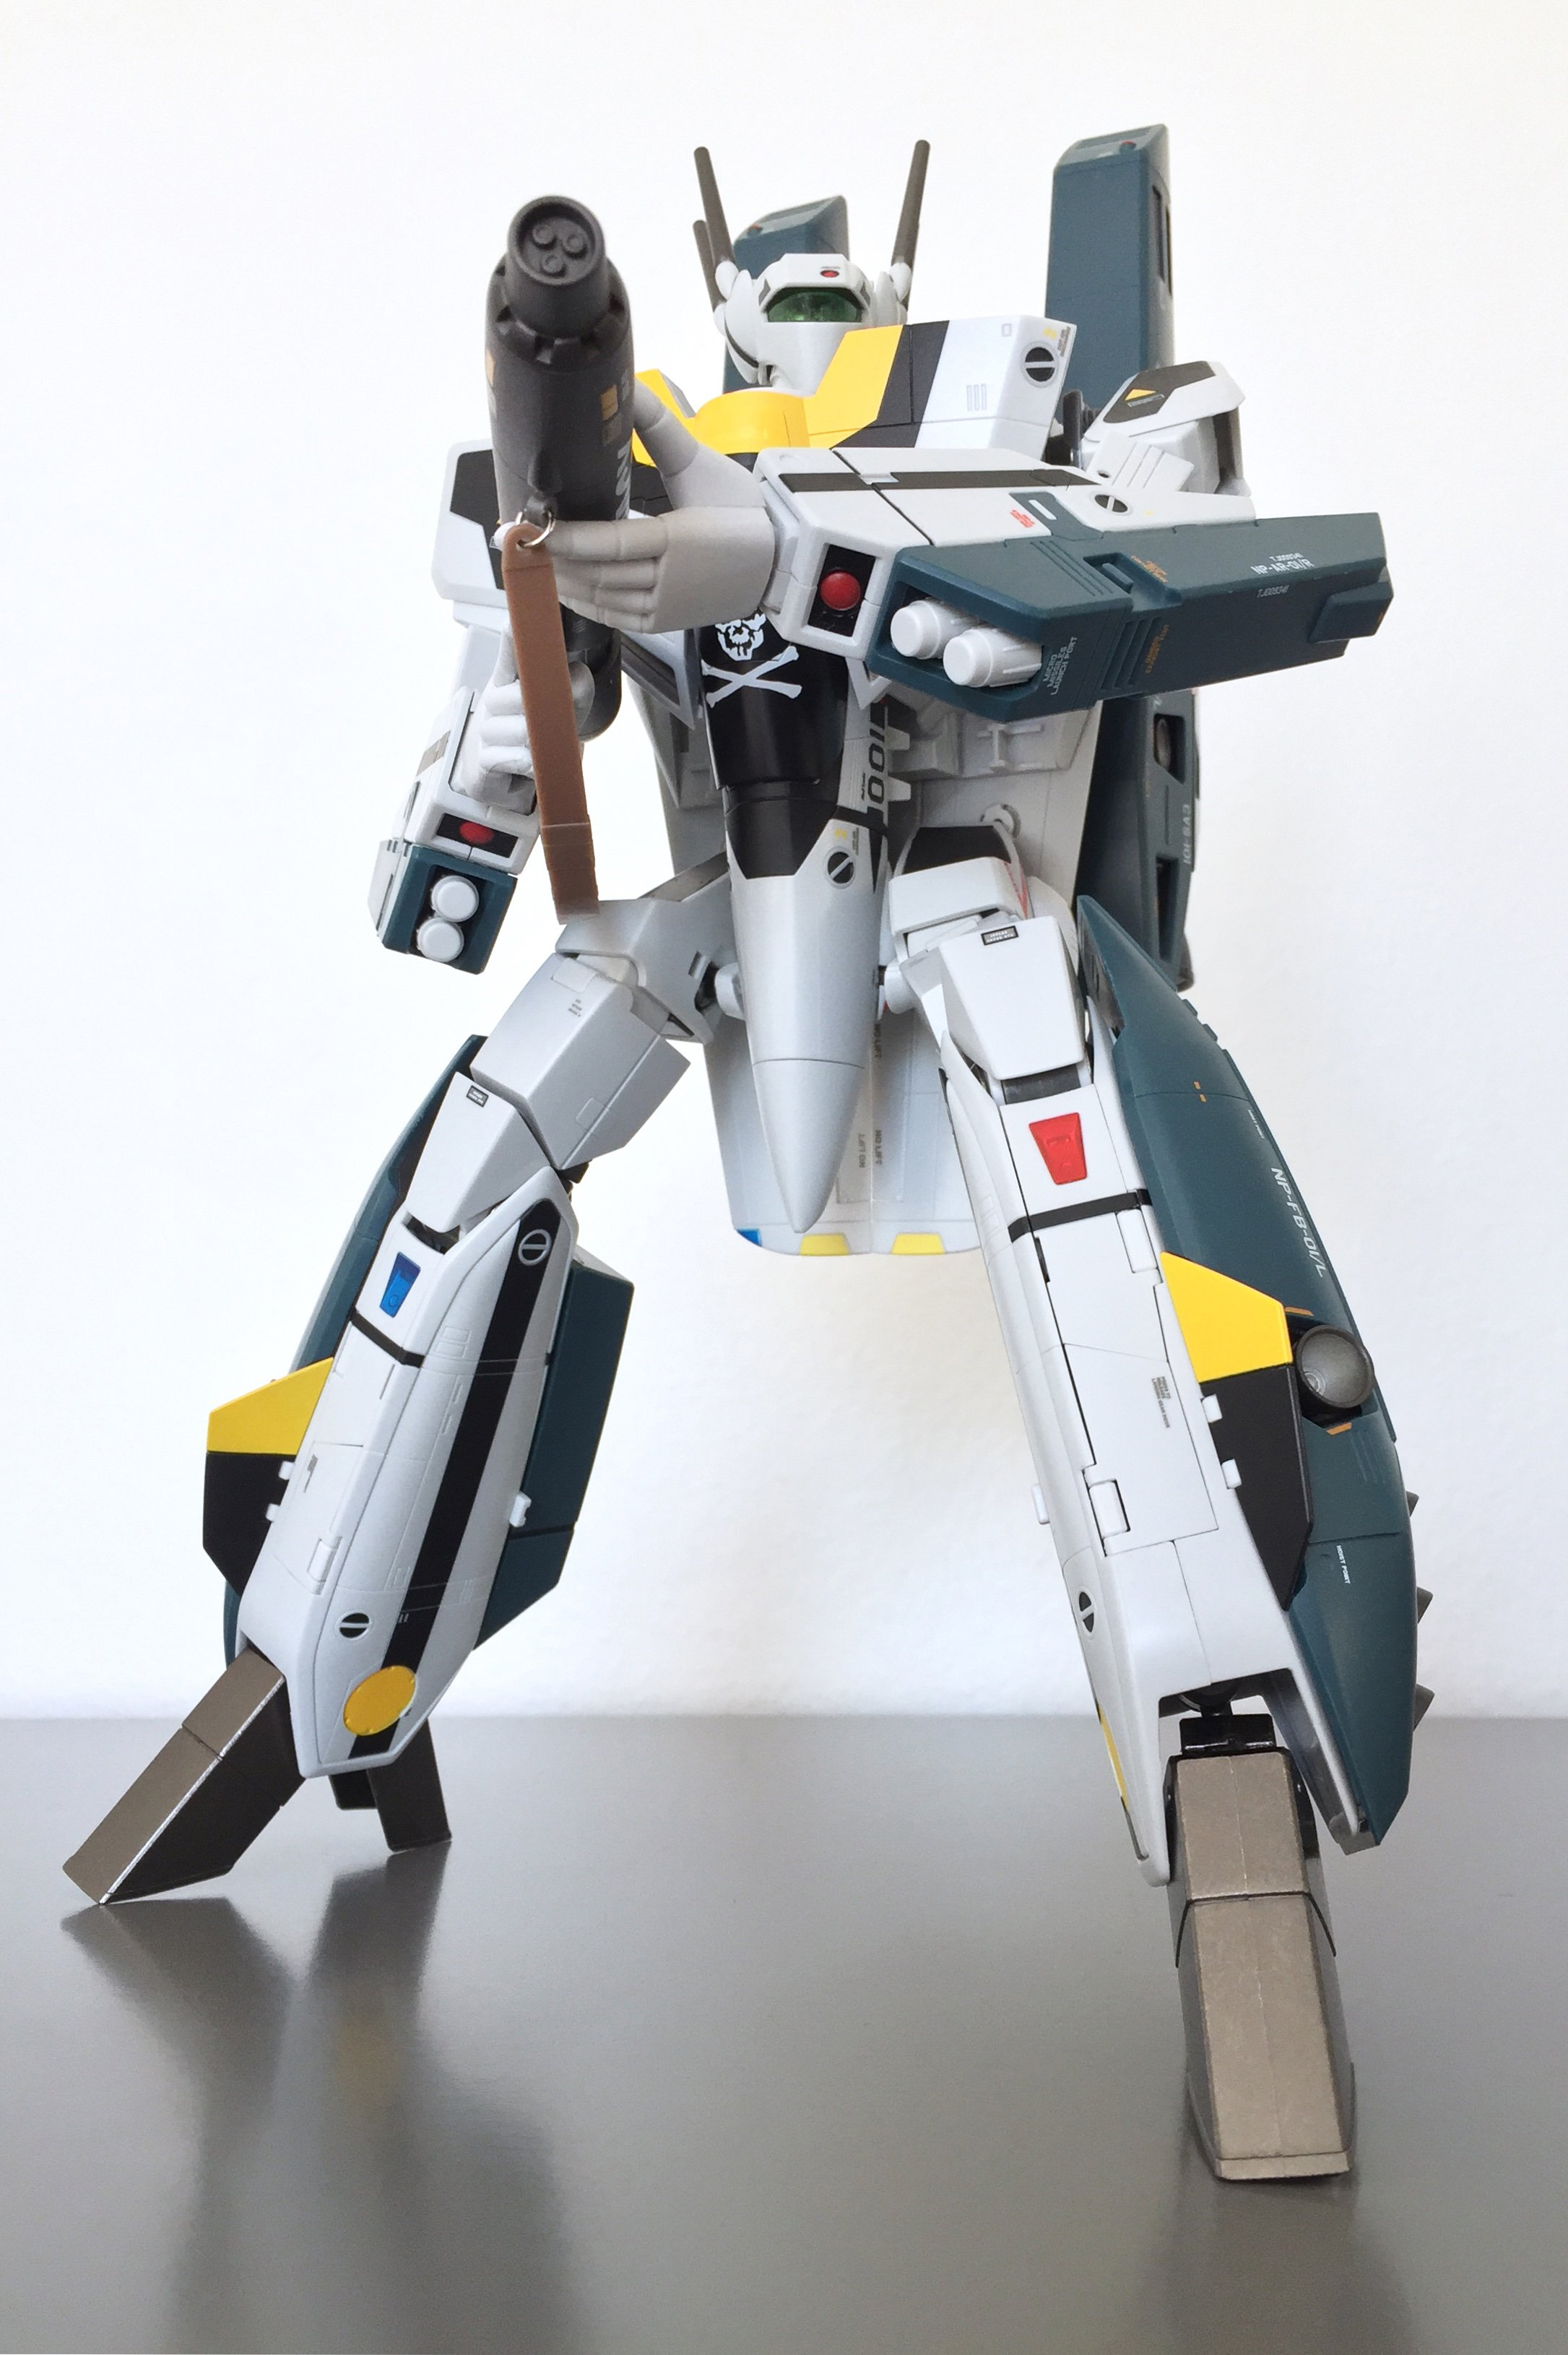 dxvf1sroy12